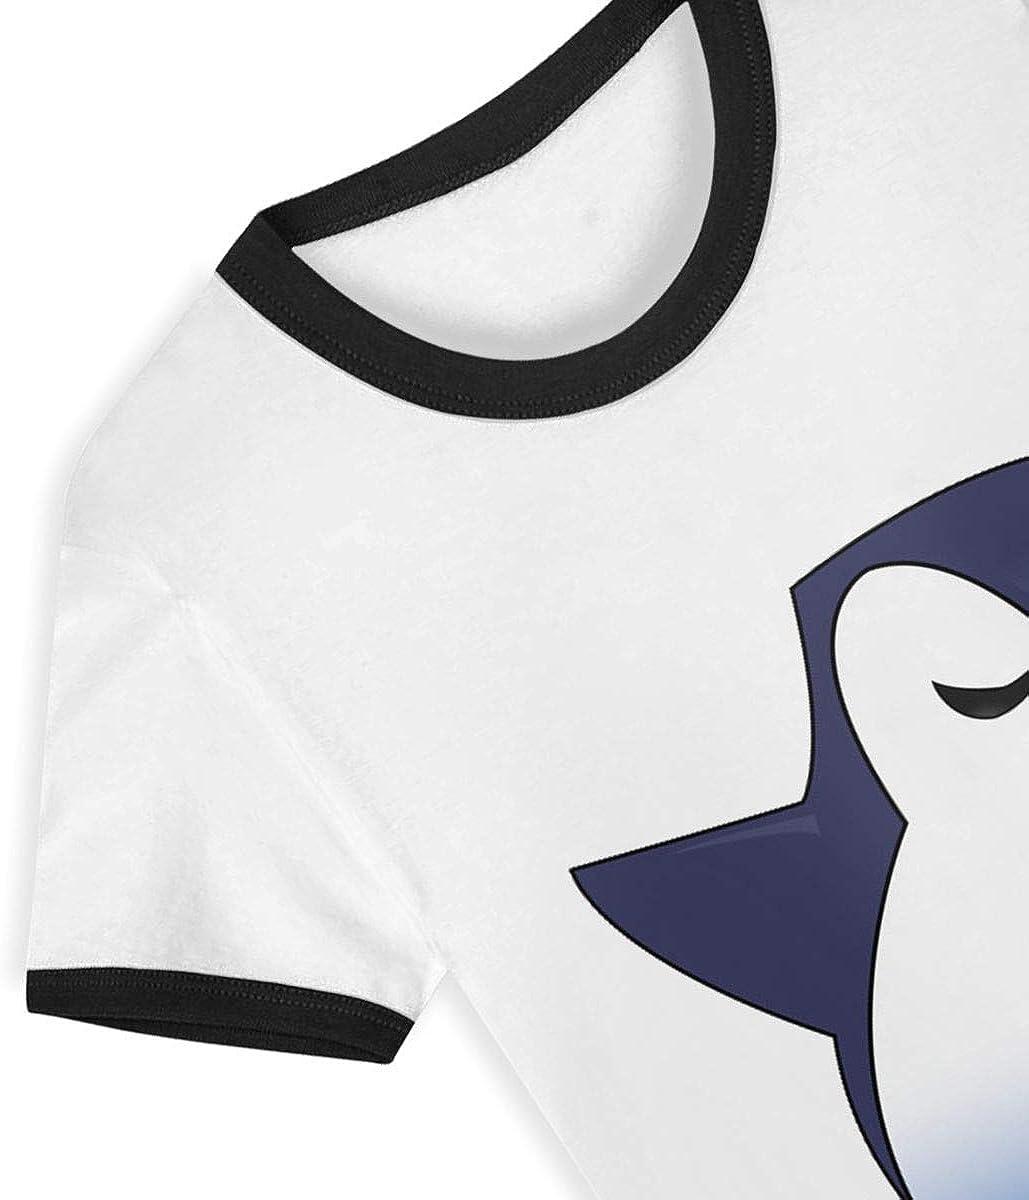 AMMAaaa Dabbing Penguin Kids T-Shirt Childrens Short Sleeve Shirts Printed Boys Girls